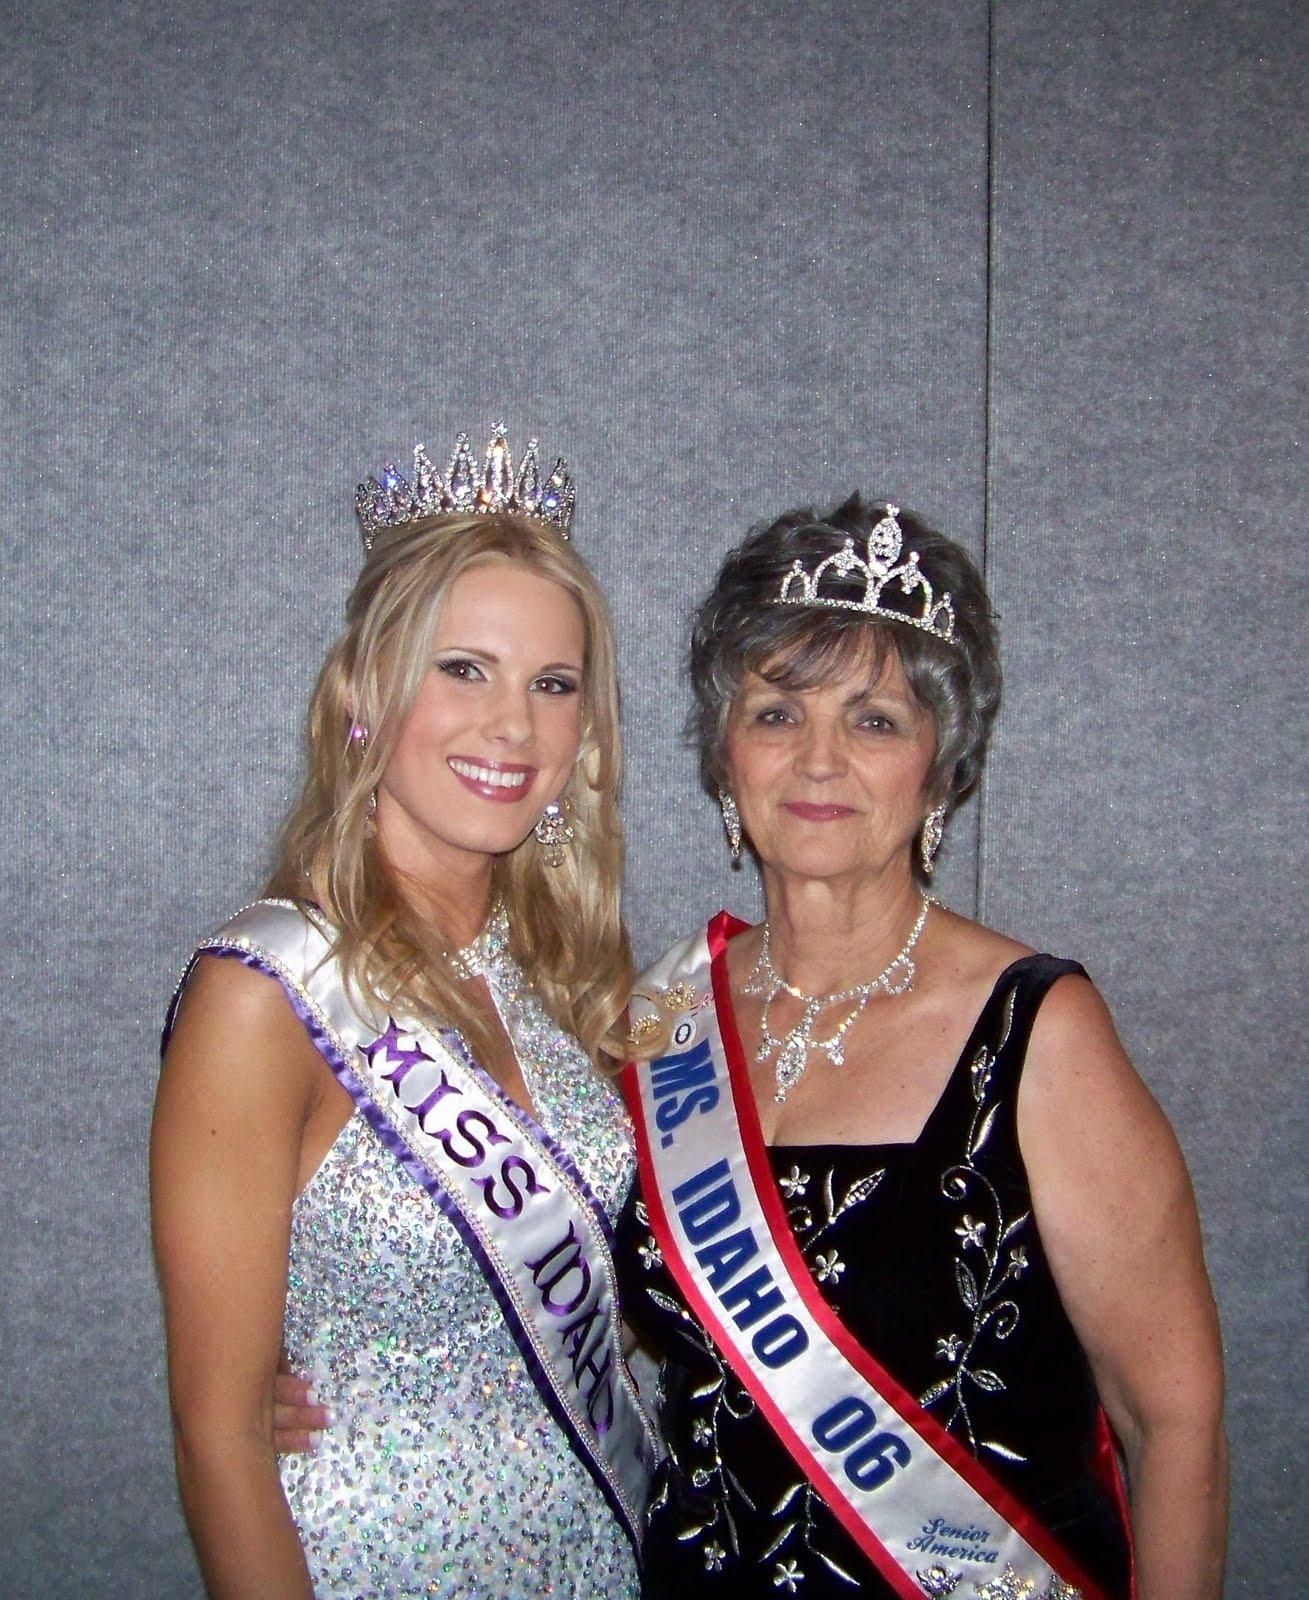 Heather Marie Mallary-Orchard: September 2010